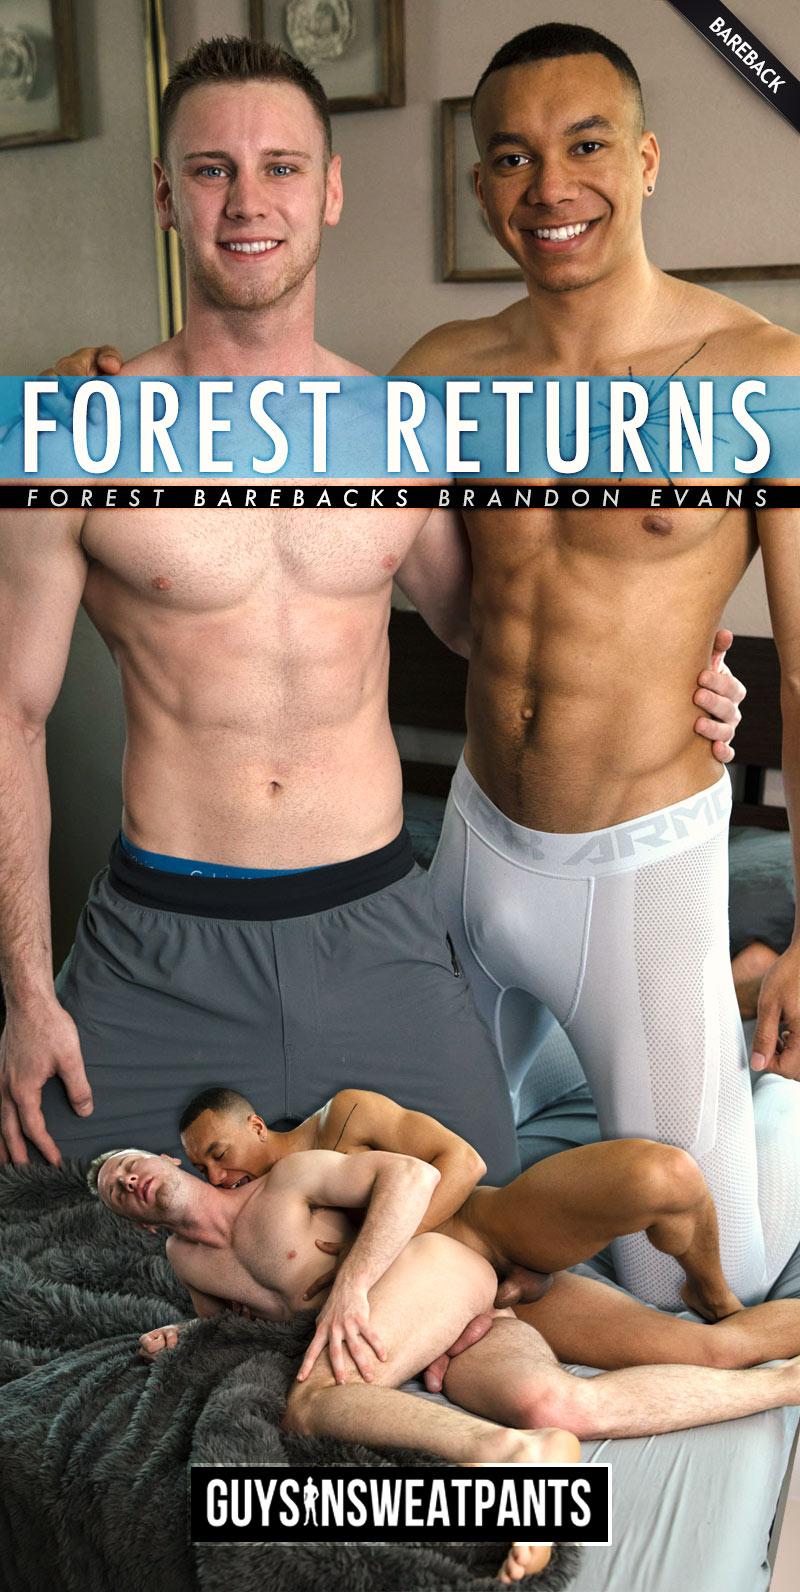 Forest Barebacks Brandon Evans at Guys In Sweatpants